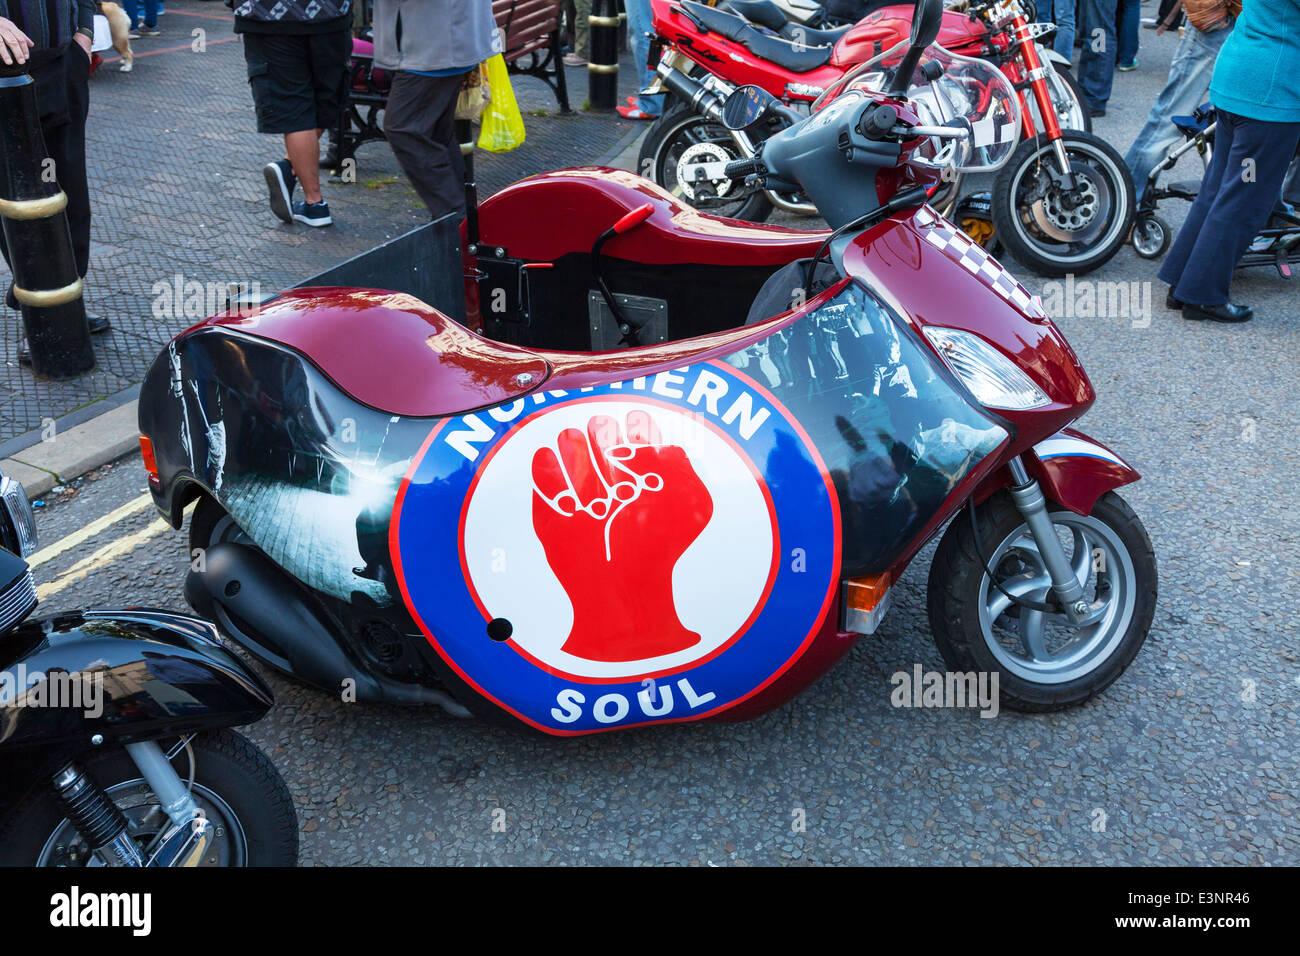 Northern soul fist sign emblem on scooter - Stock Image